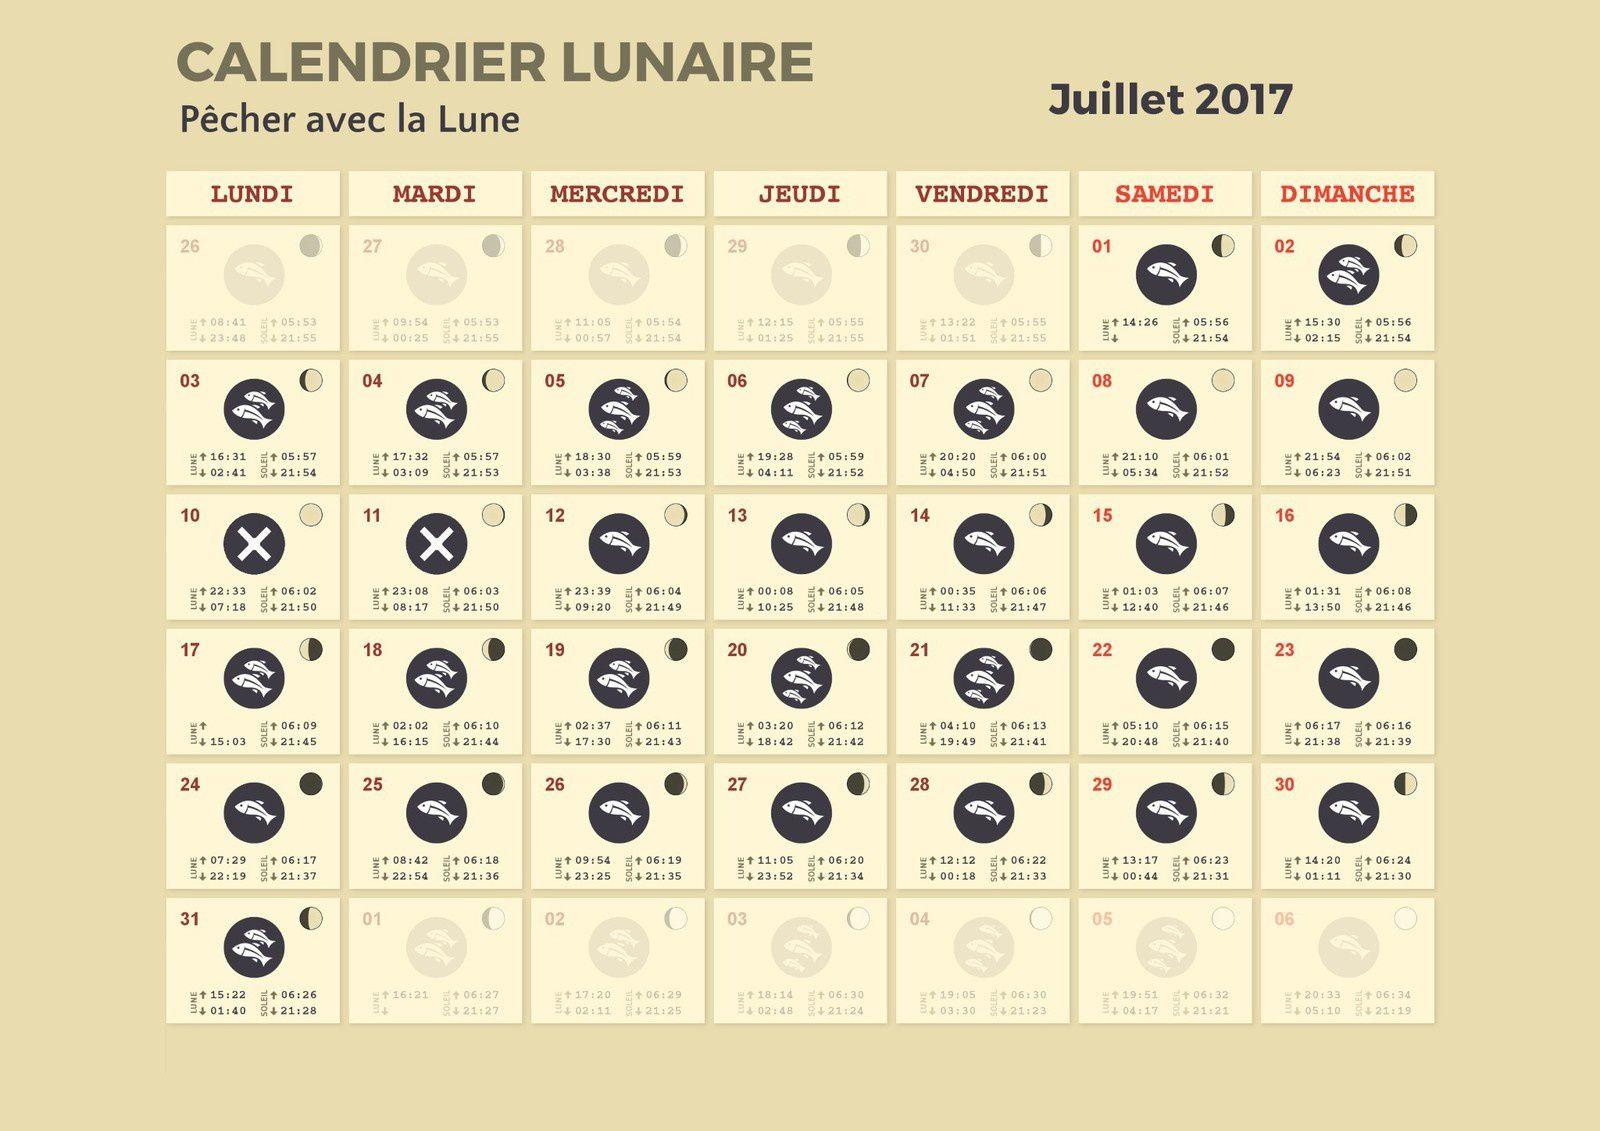 Calendrier lunaire de juillet 2017